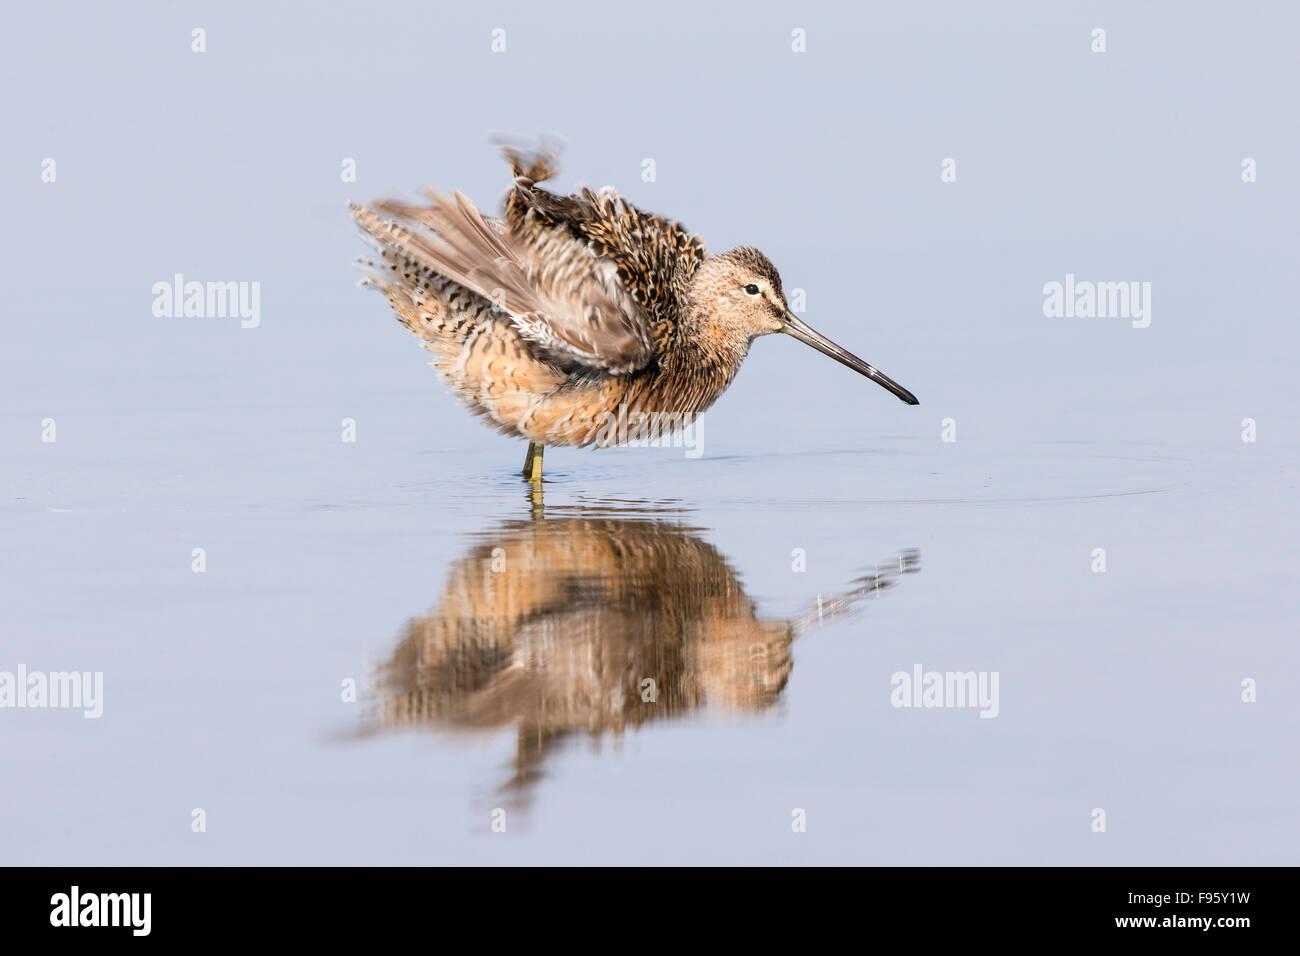 Dowitcher (Limnodromus sp.), ruffling feathers, Burnaby Lake, Burnaby, British Columbia. - Stock Image